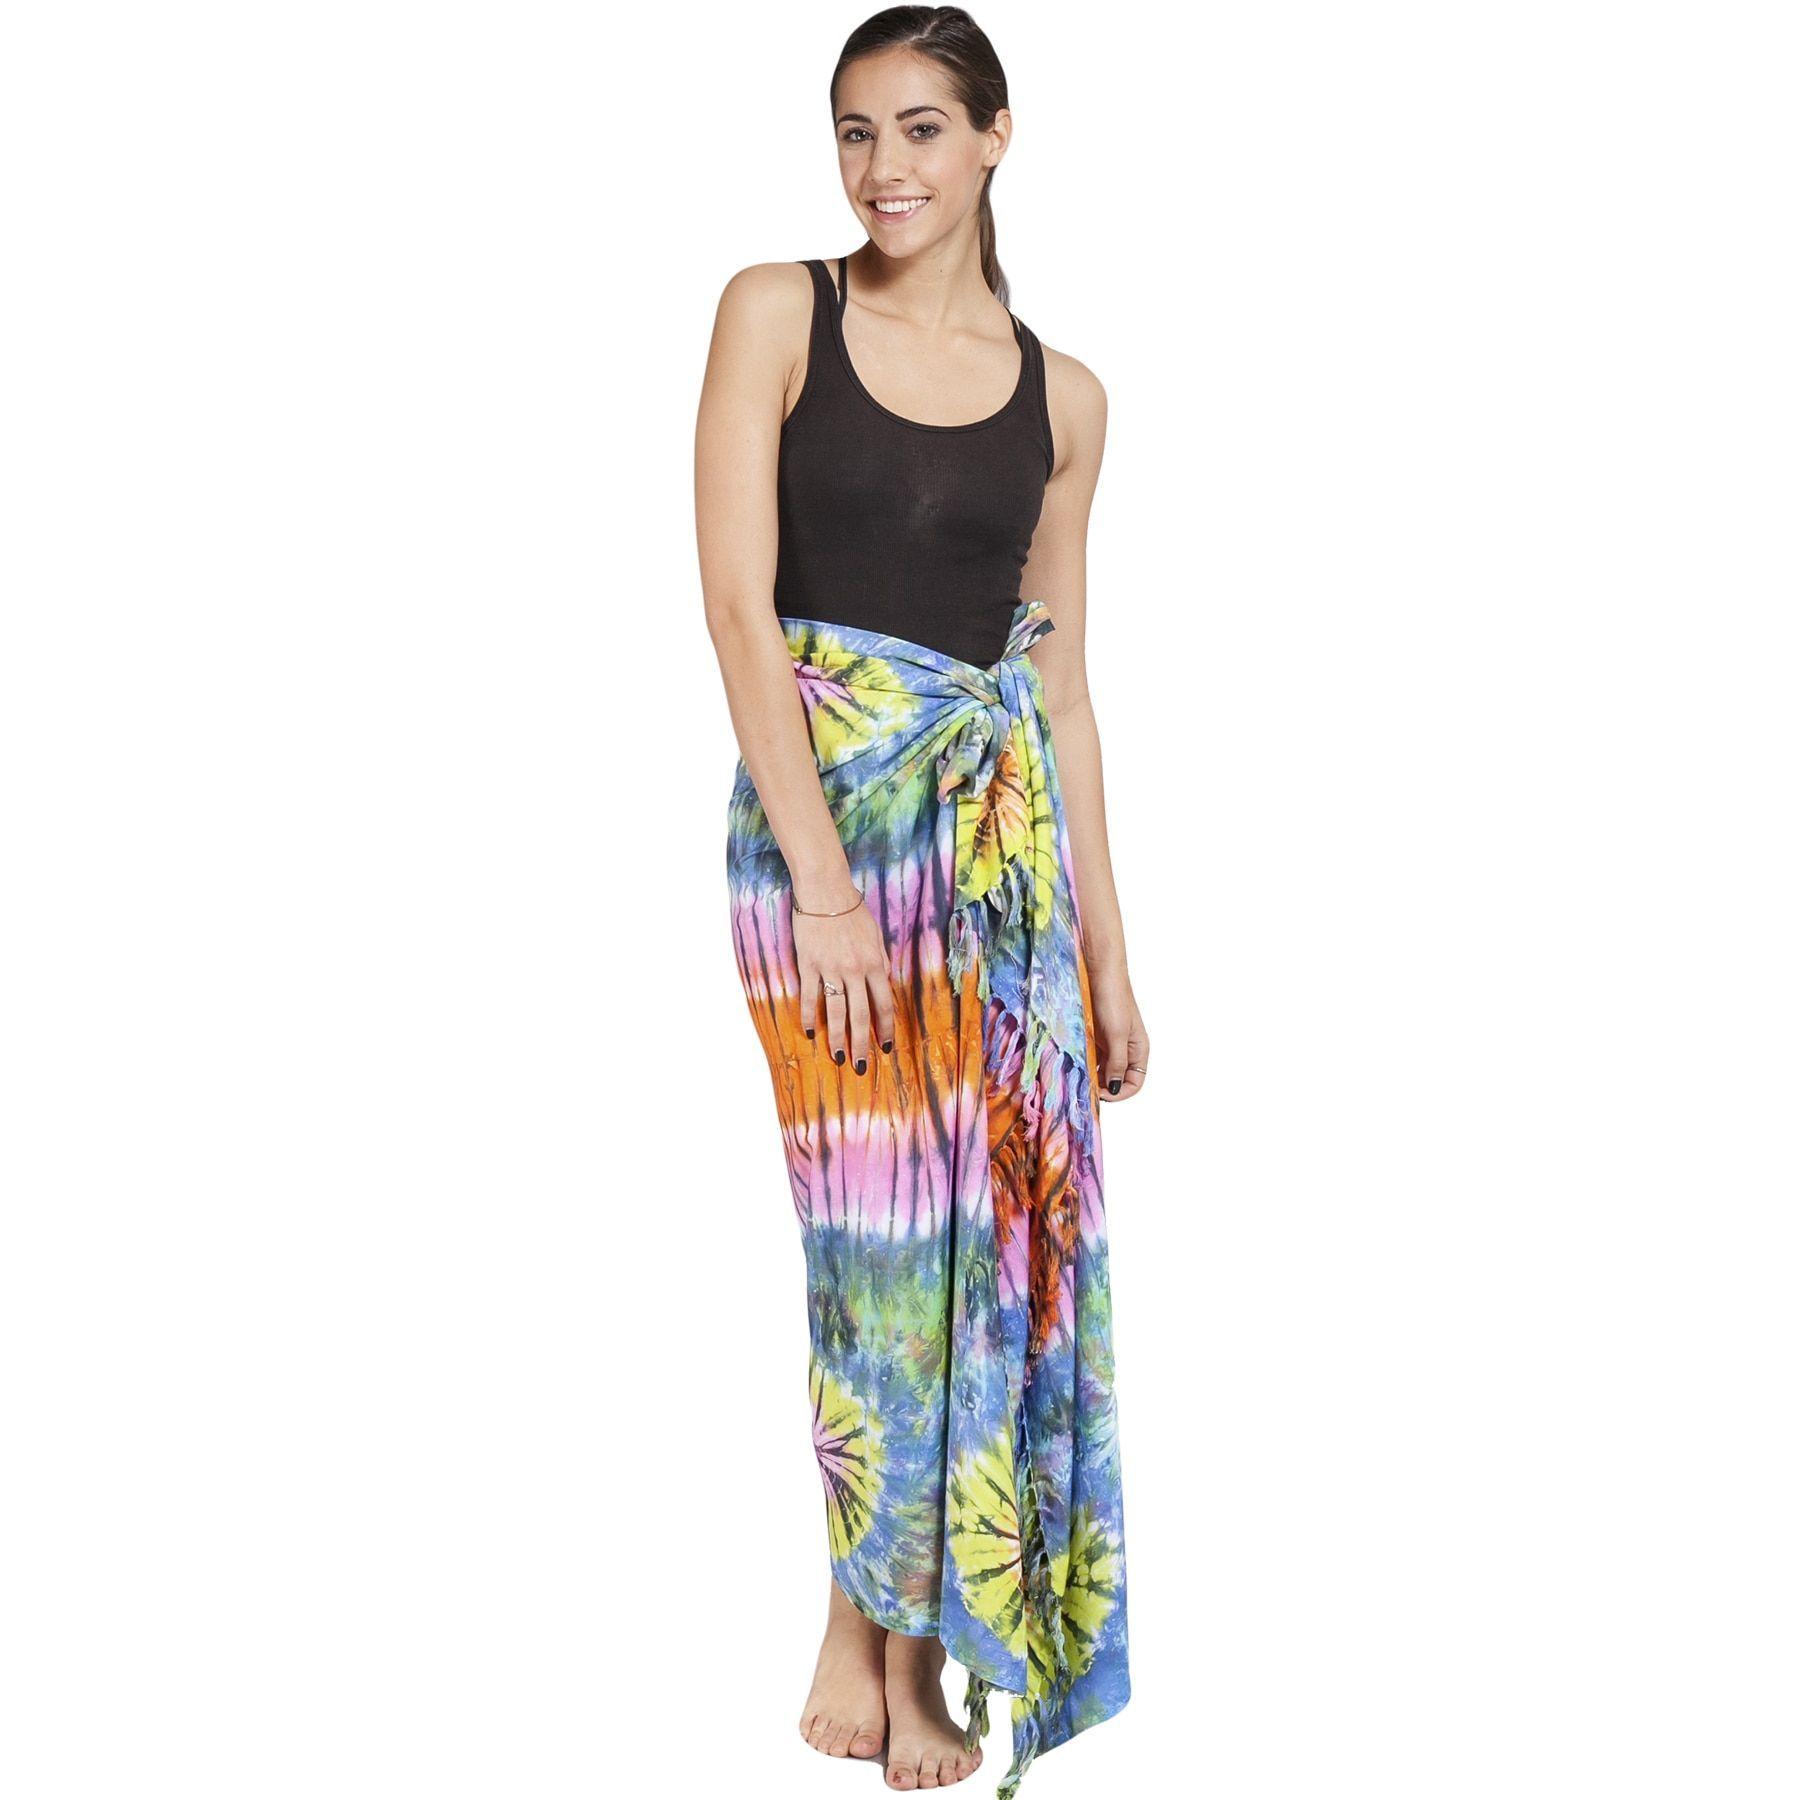 Women's Colorful Sarong Wrap